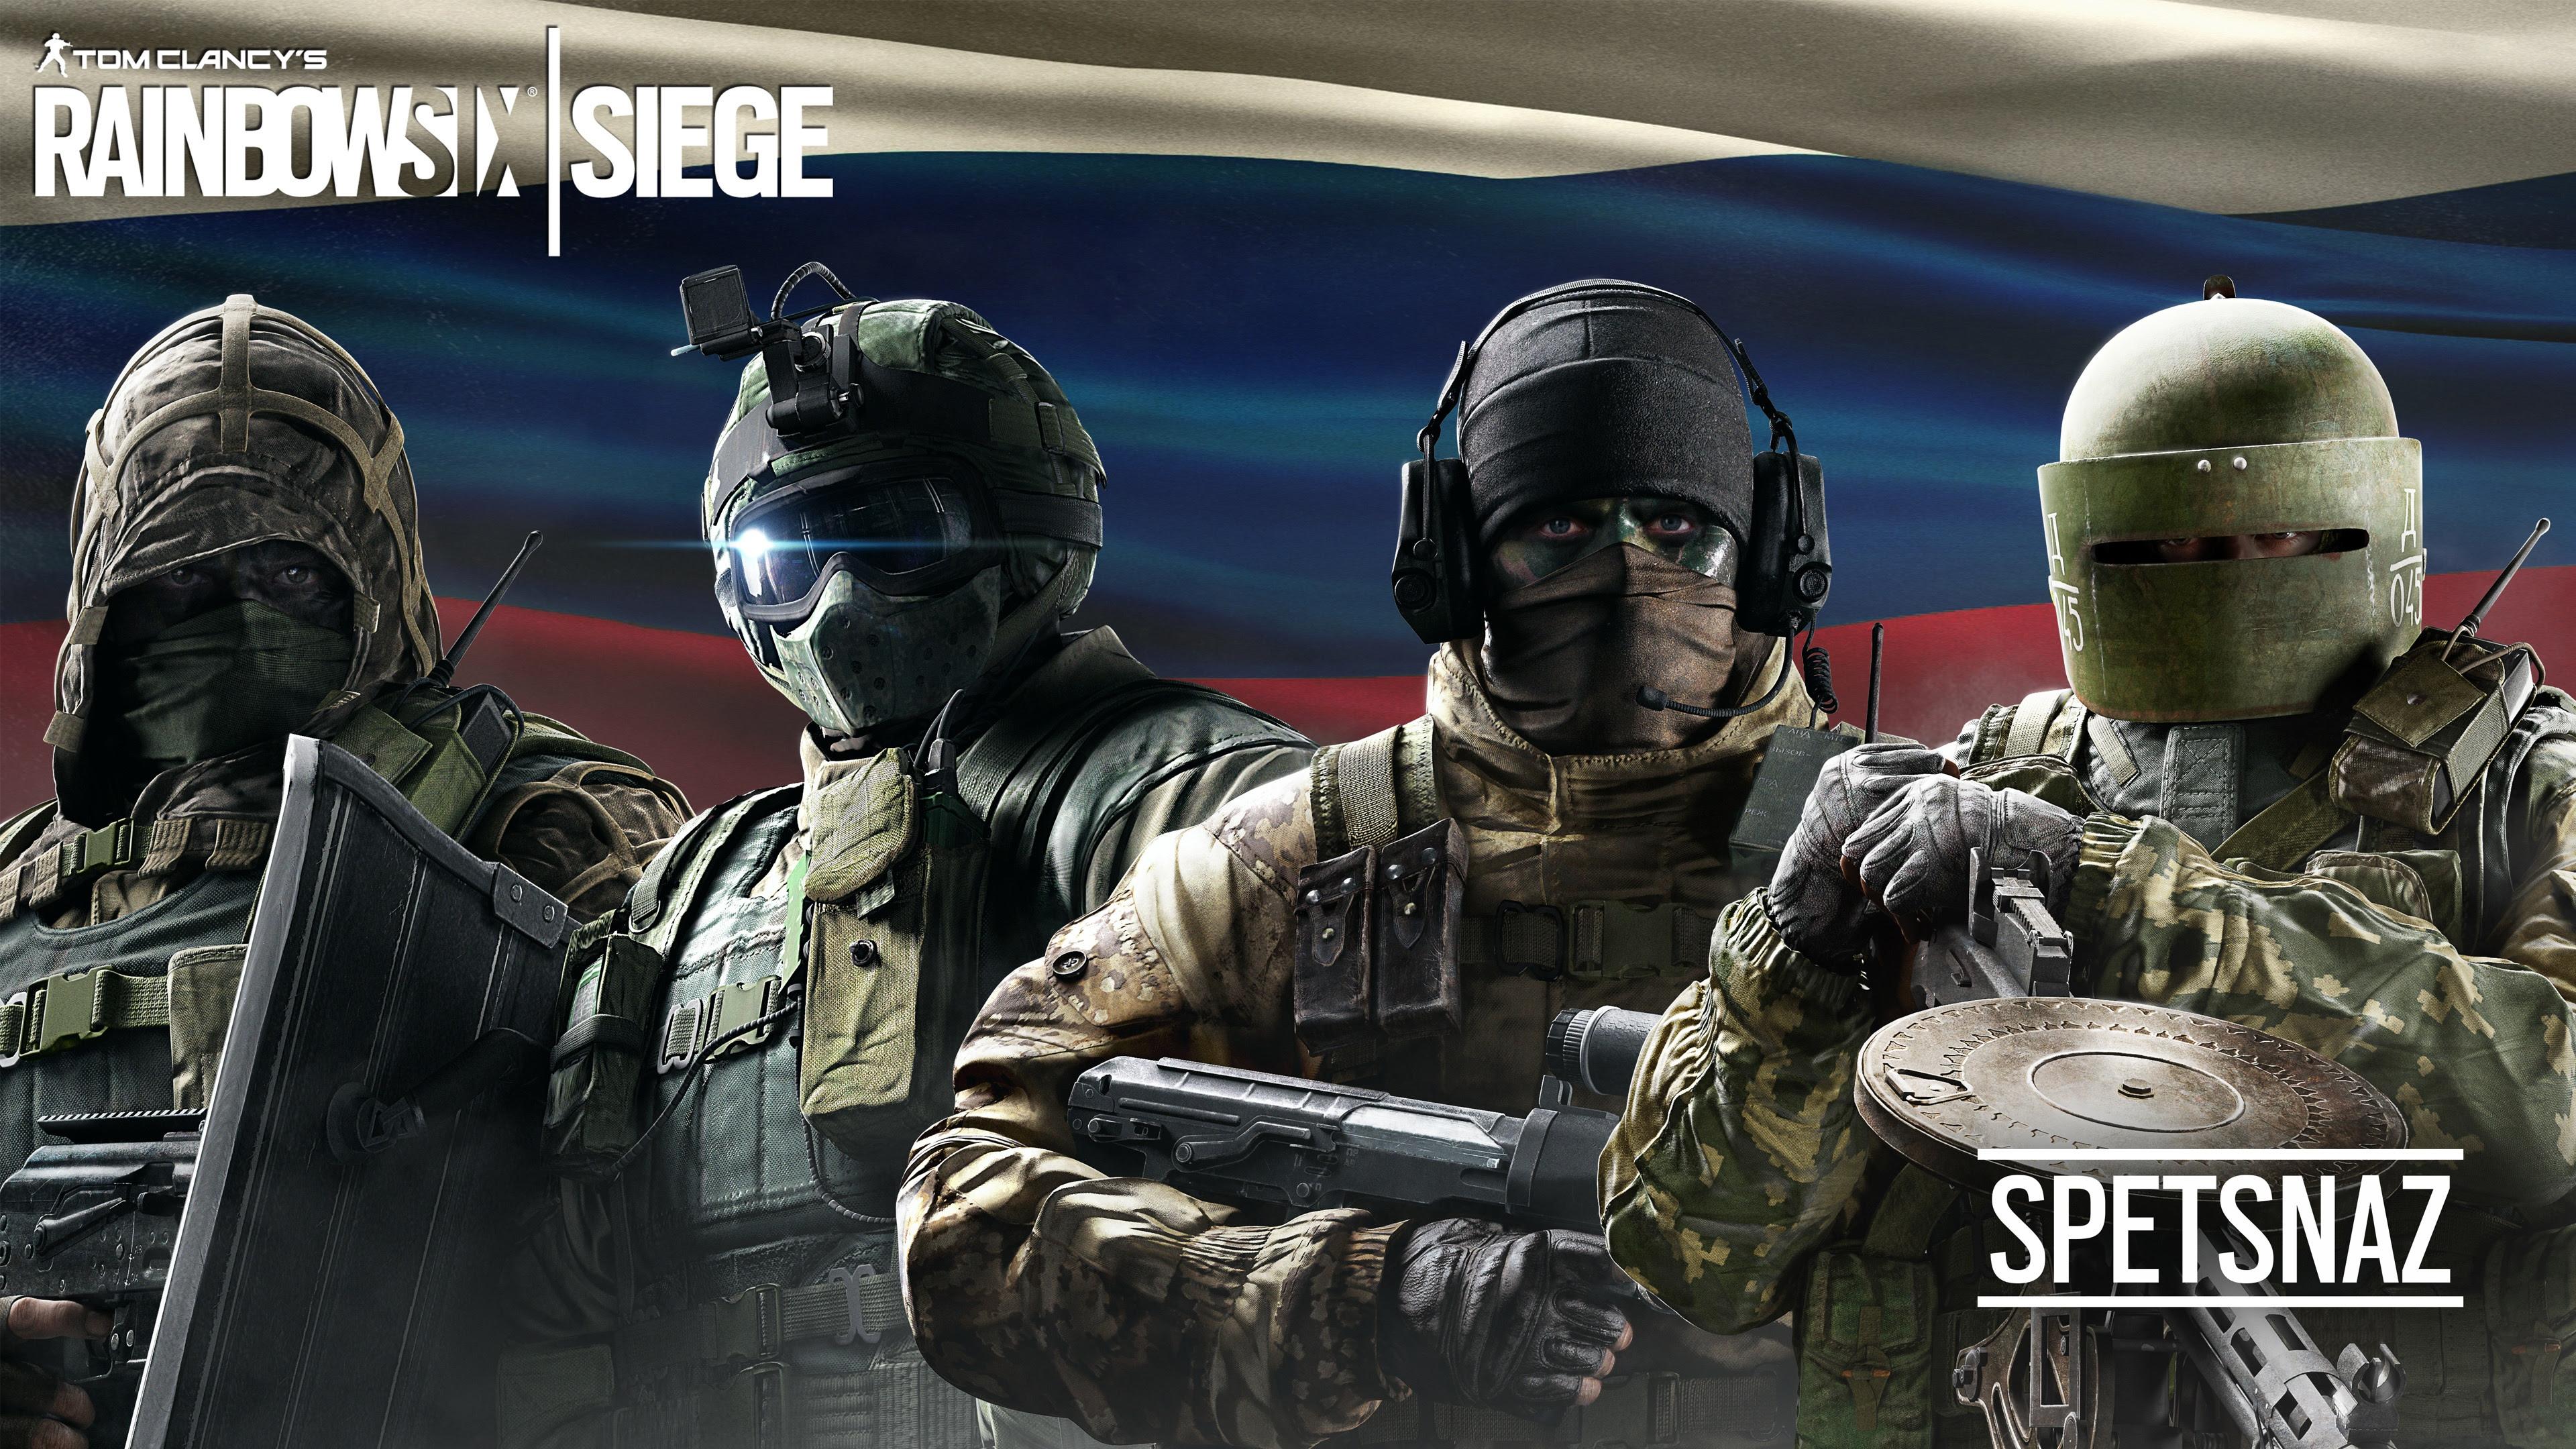 Tom Clancy S Rainbow Six Siege Spetsnaz Wallpapers In Jpg Format